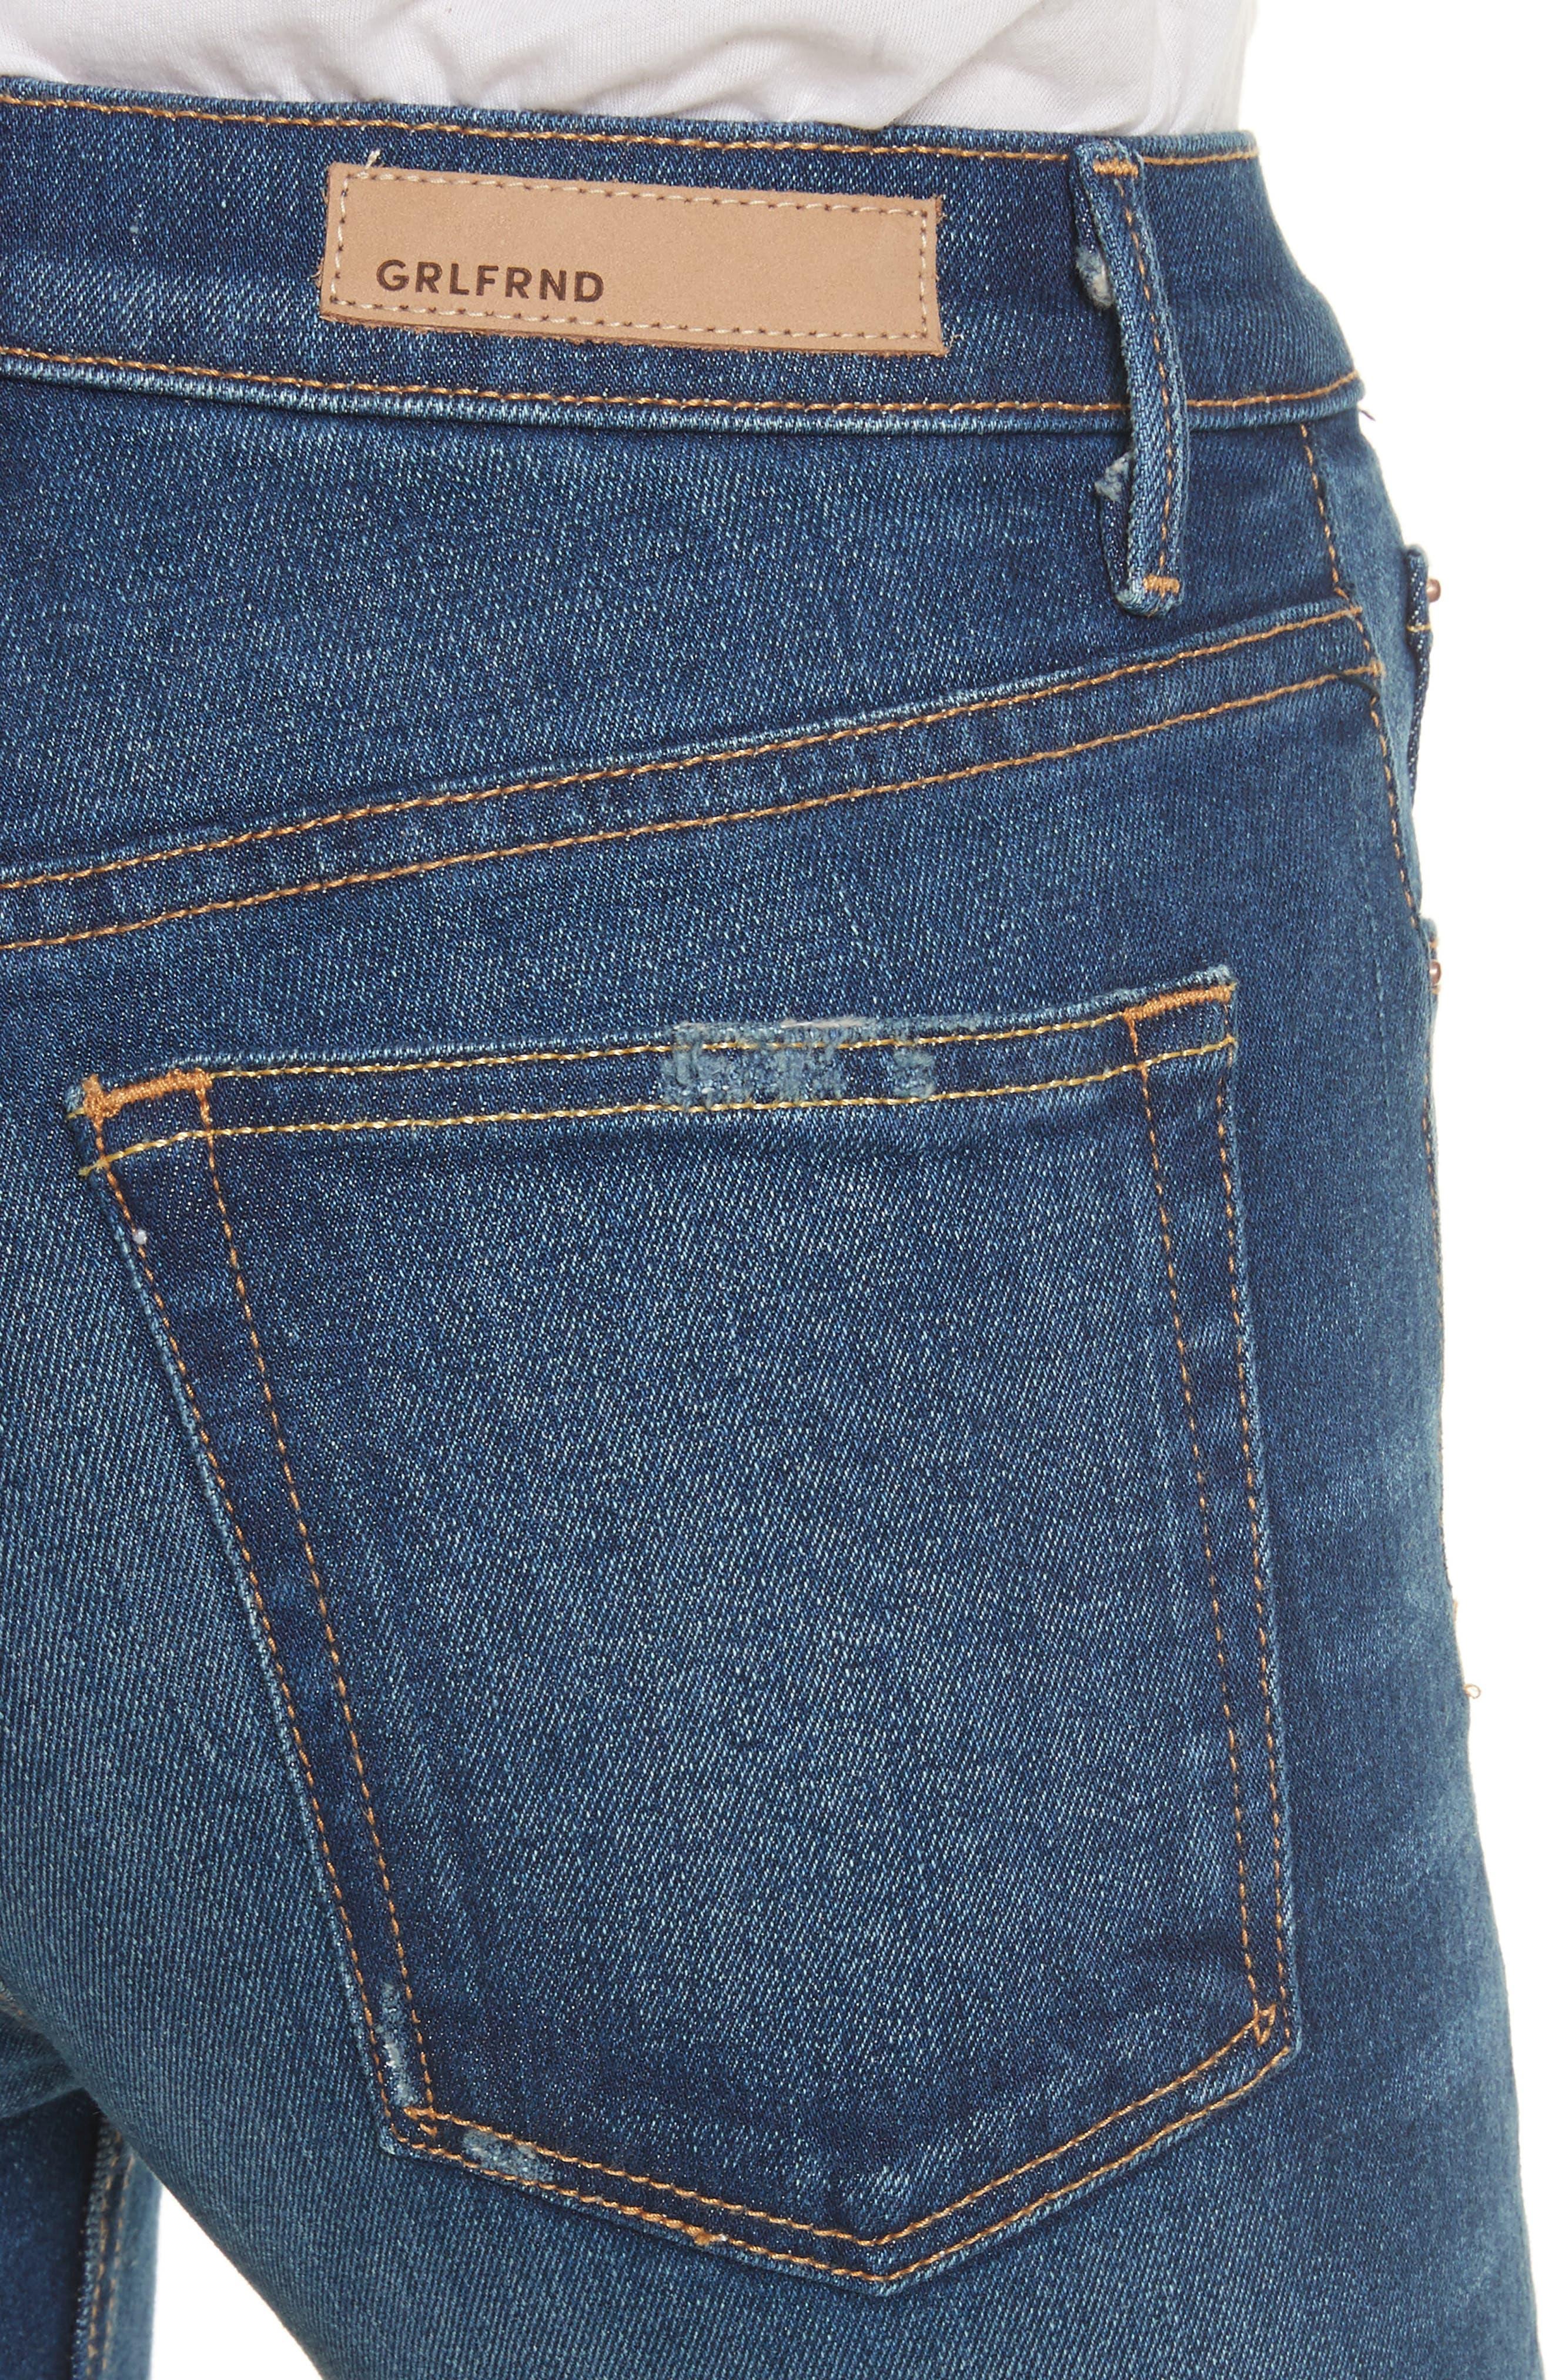 Karolina High Waist Skinny Jeans,                             Alternate thumbnail 4, color,                             Joan Jett